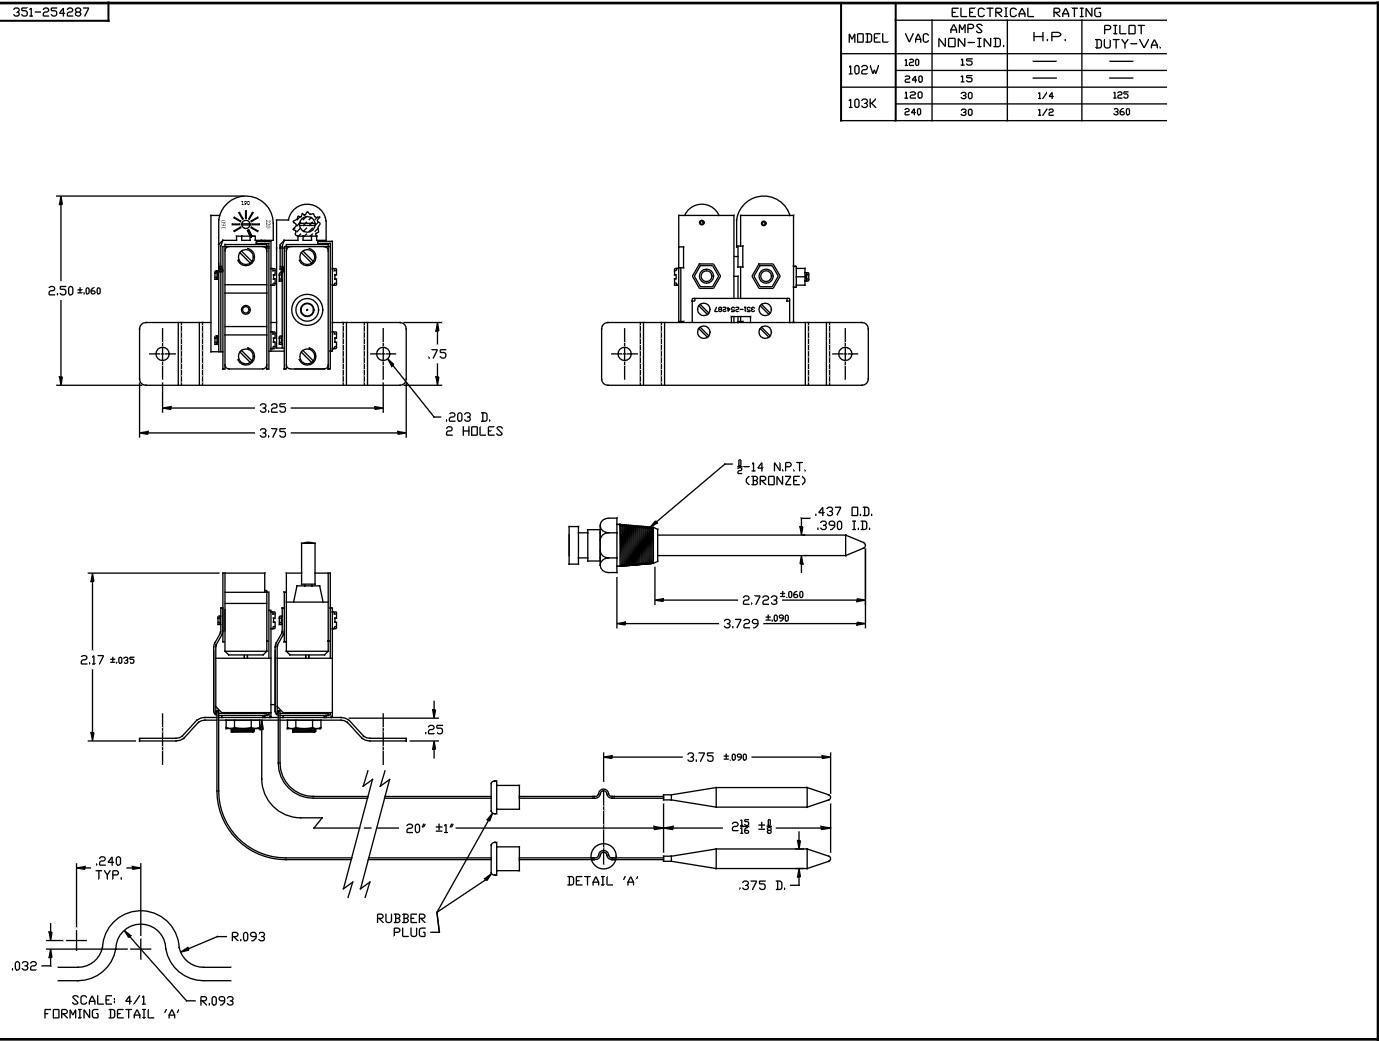 Pressure Switch Diagram Manual Reset Pressure Switch Diagram